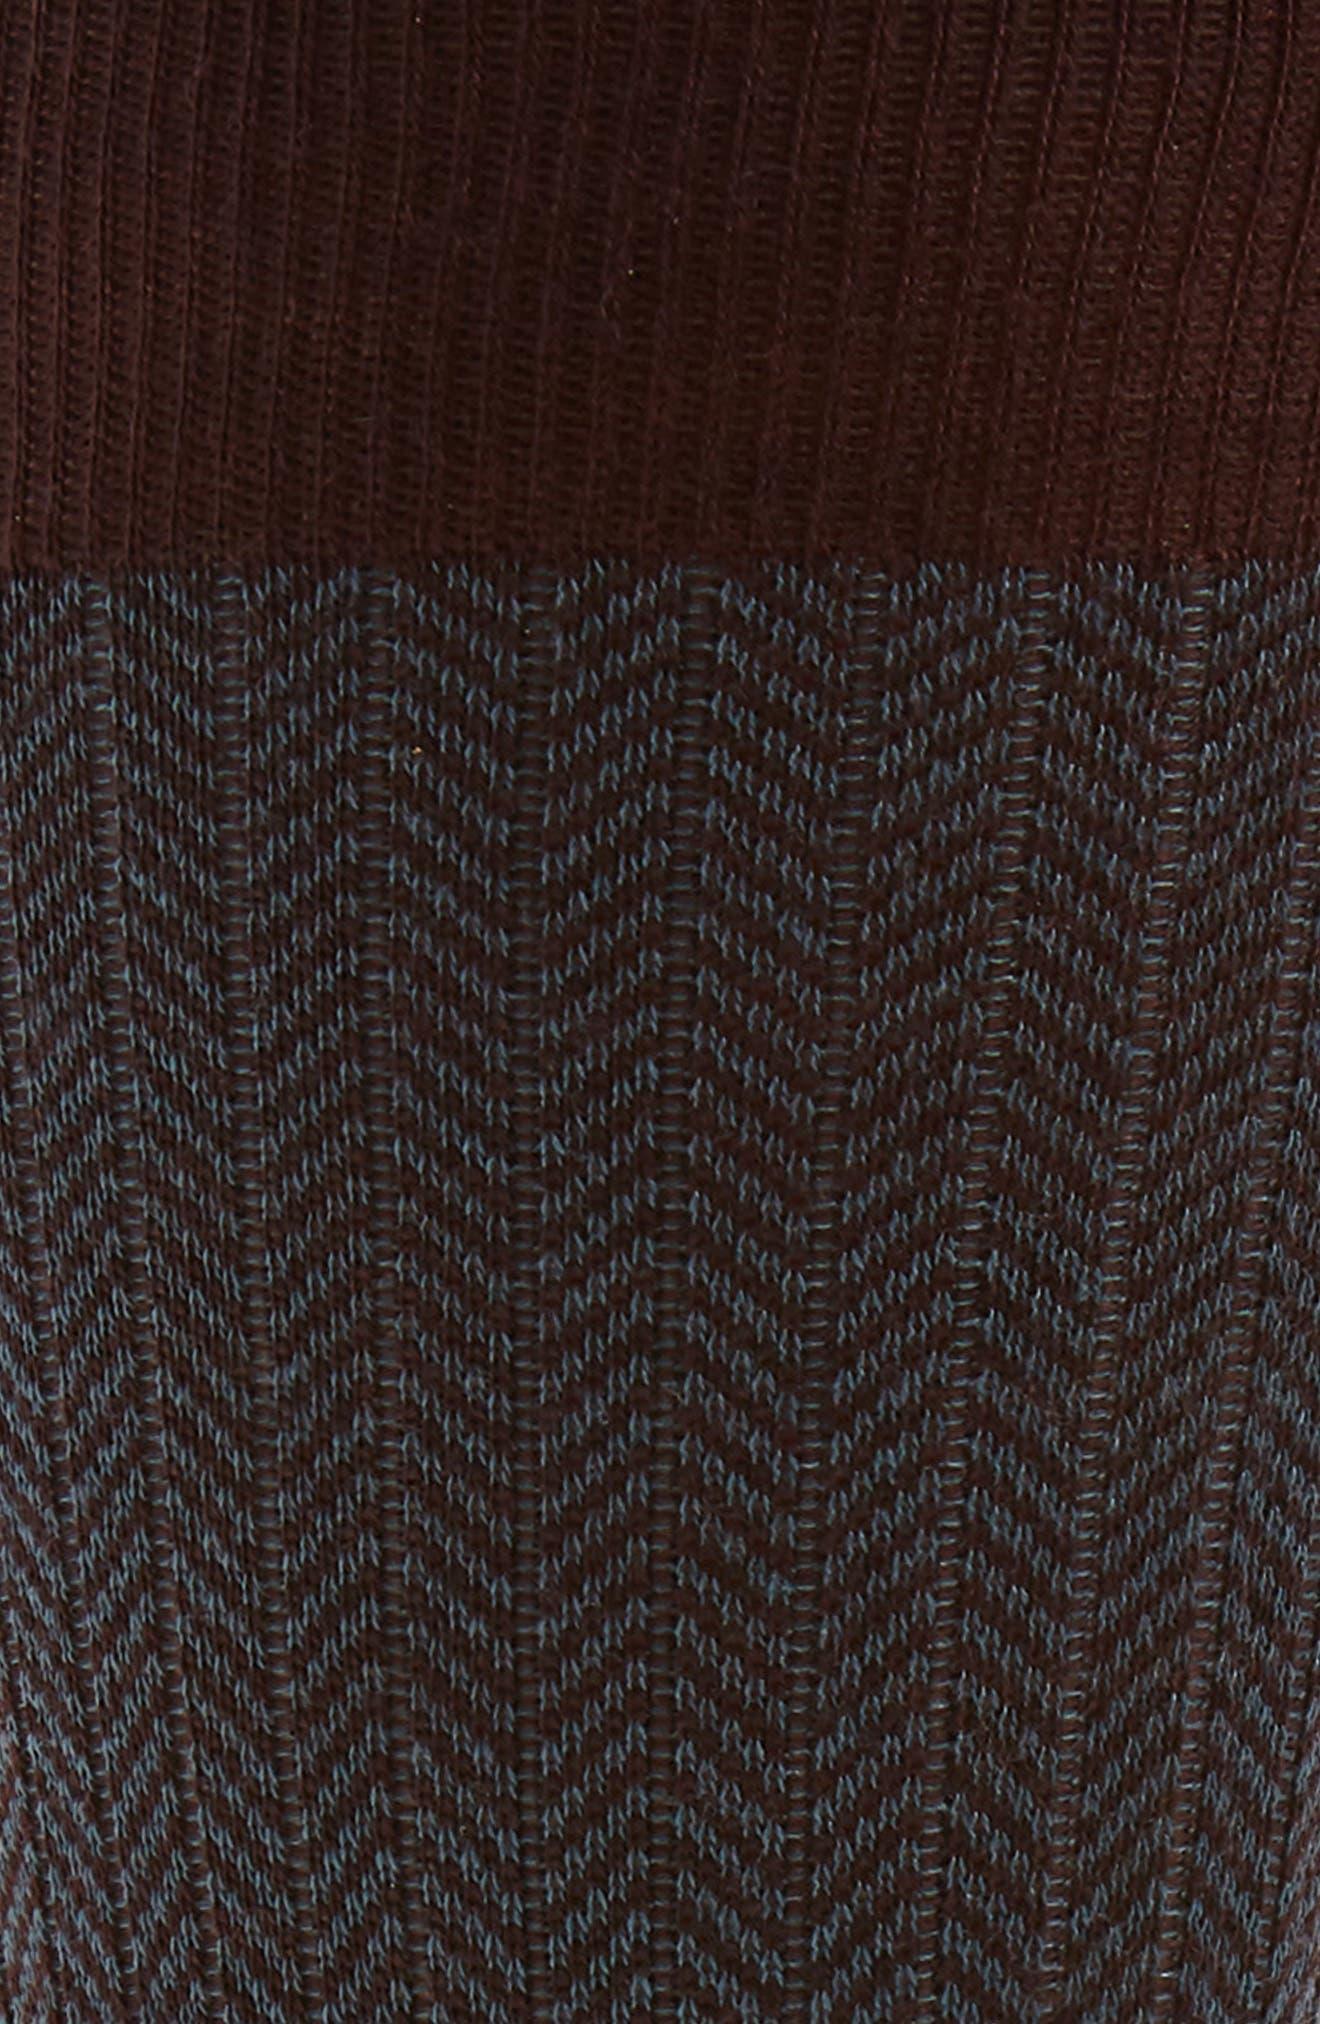 '5911' Mid-Calf Dress Socks,                             Alternate thumbnail 2, color,                             MAROON 153